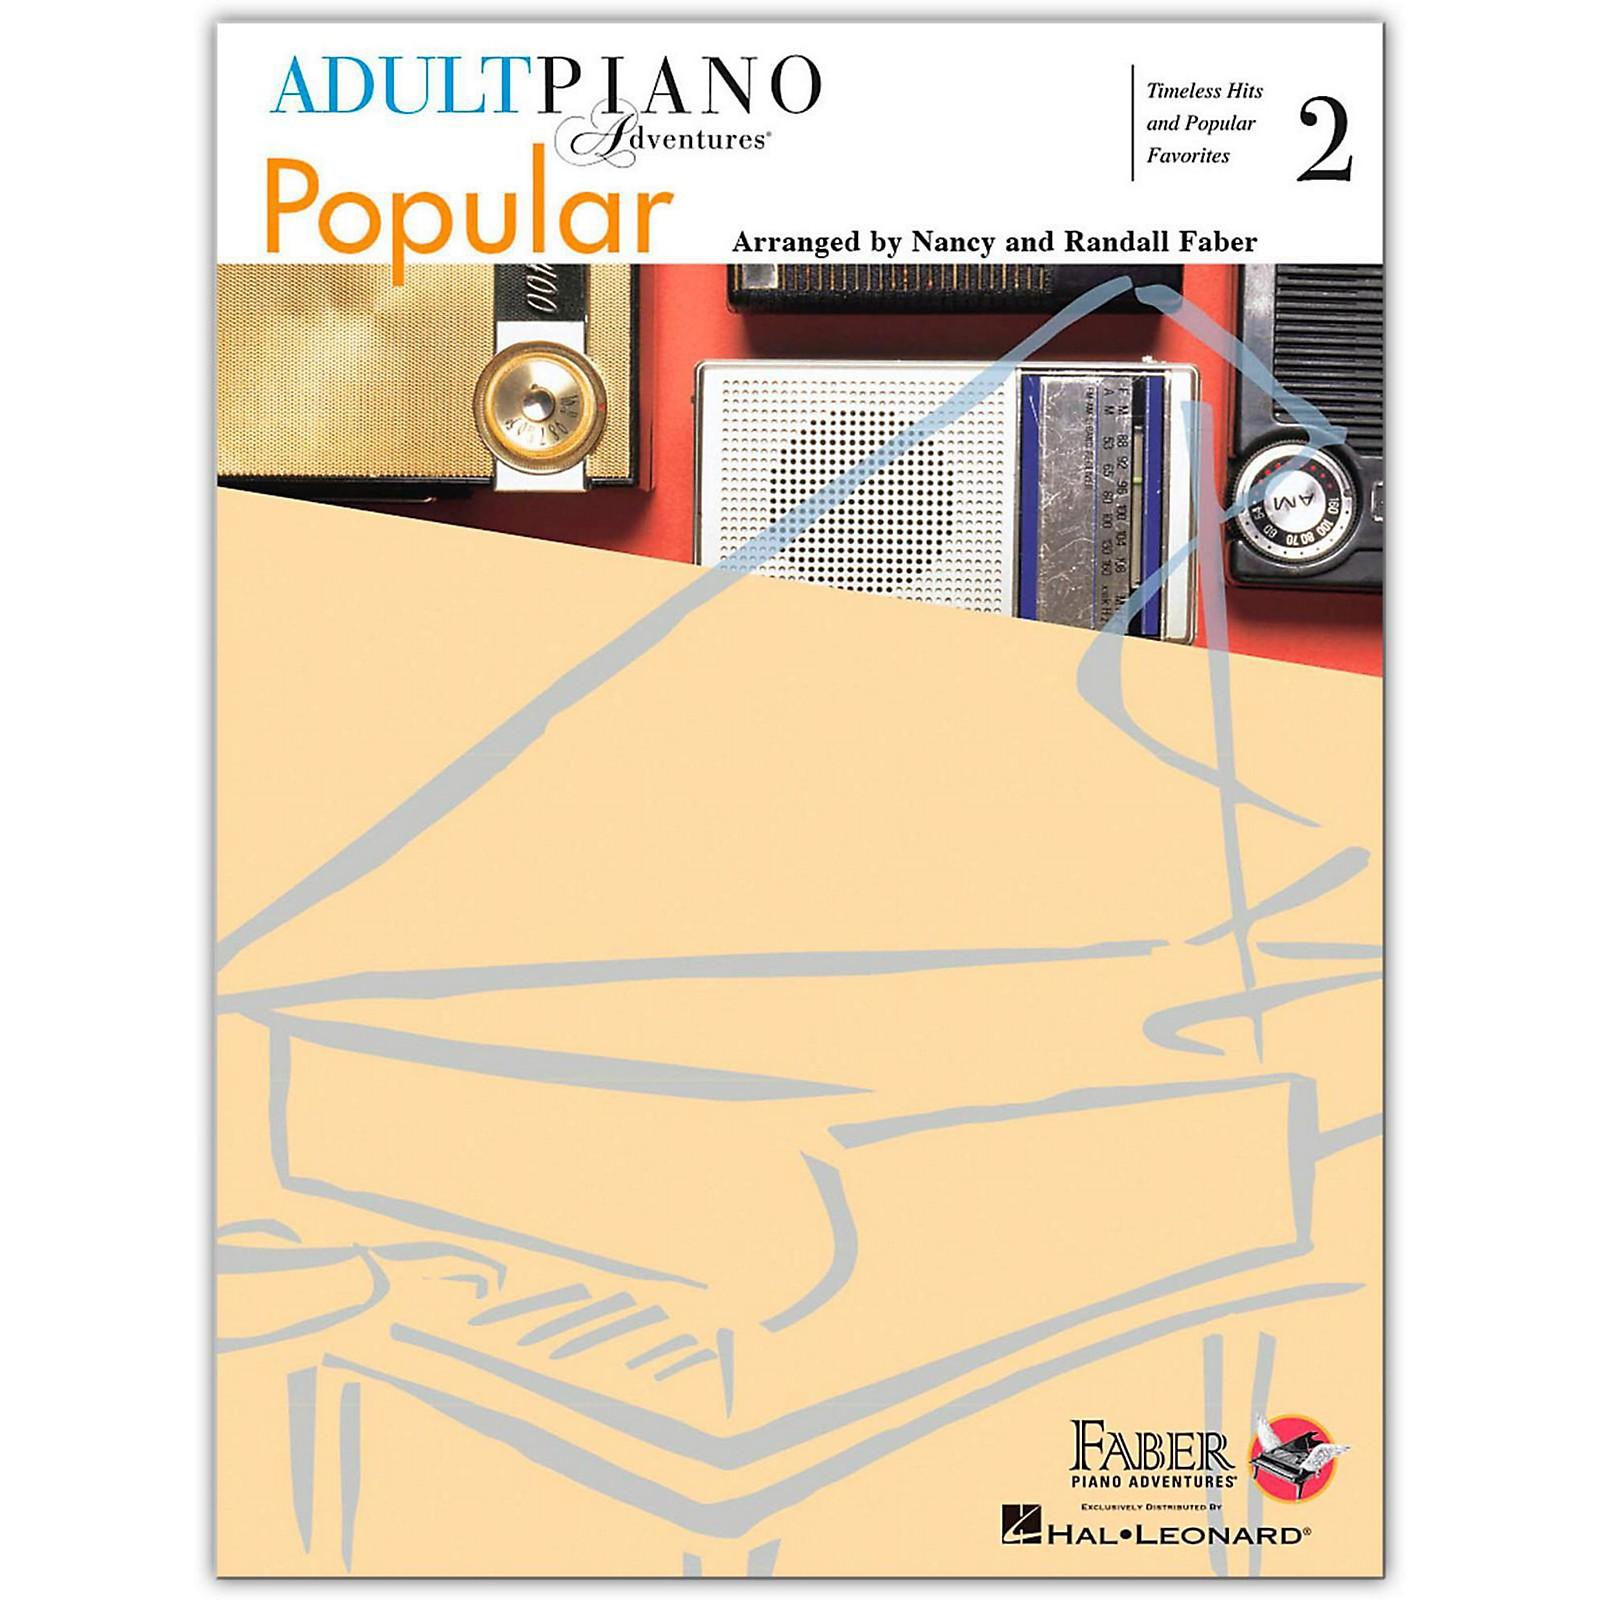 Faber Piano Adventures Adult Piano Adventures Popular Book 2 - Faber Piano Adventure